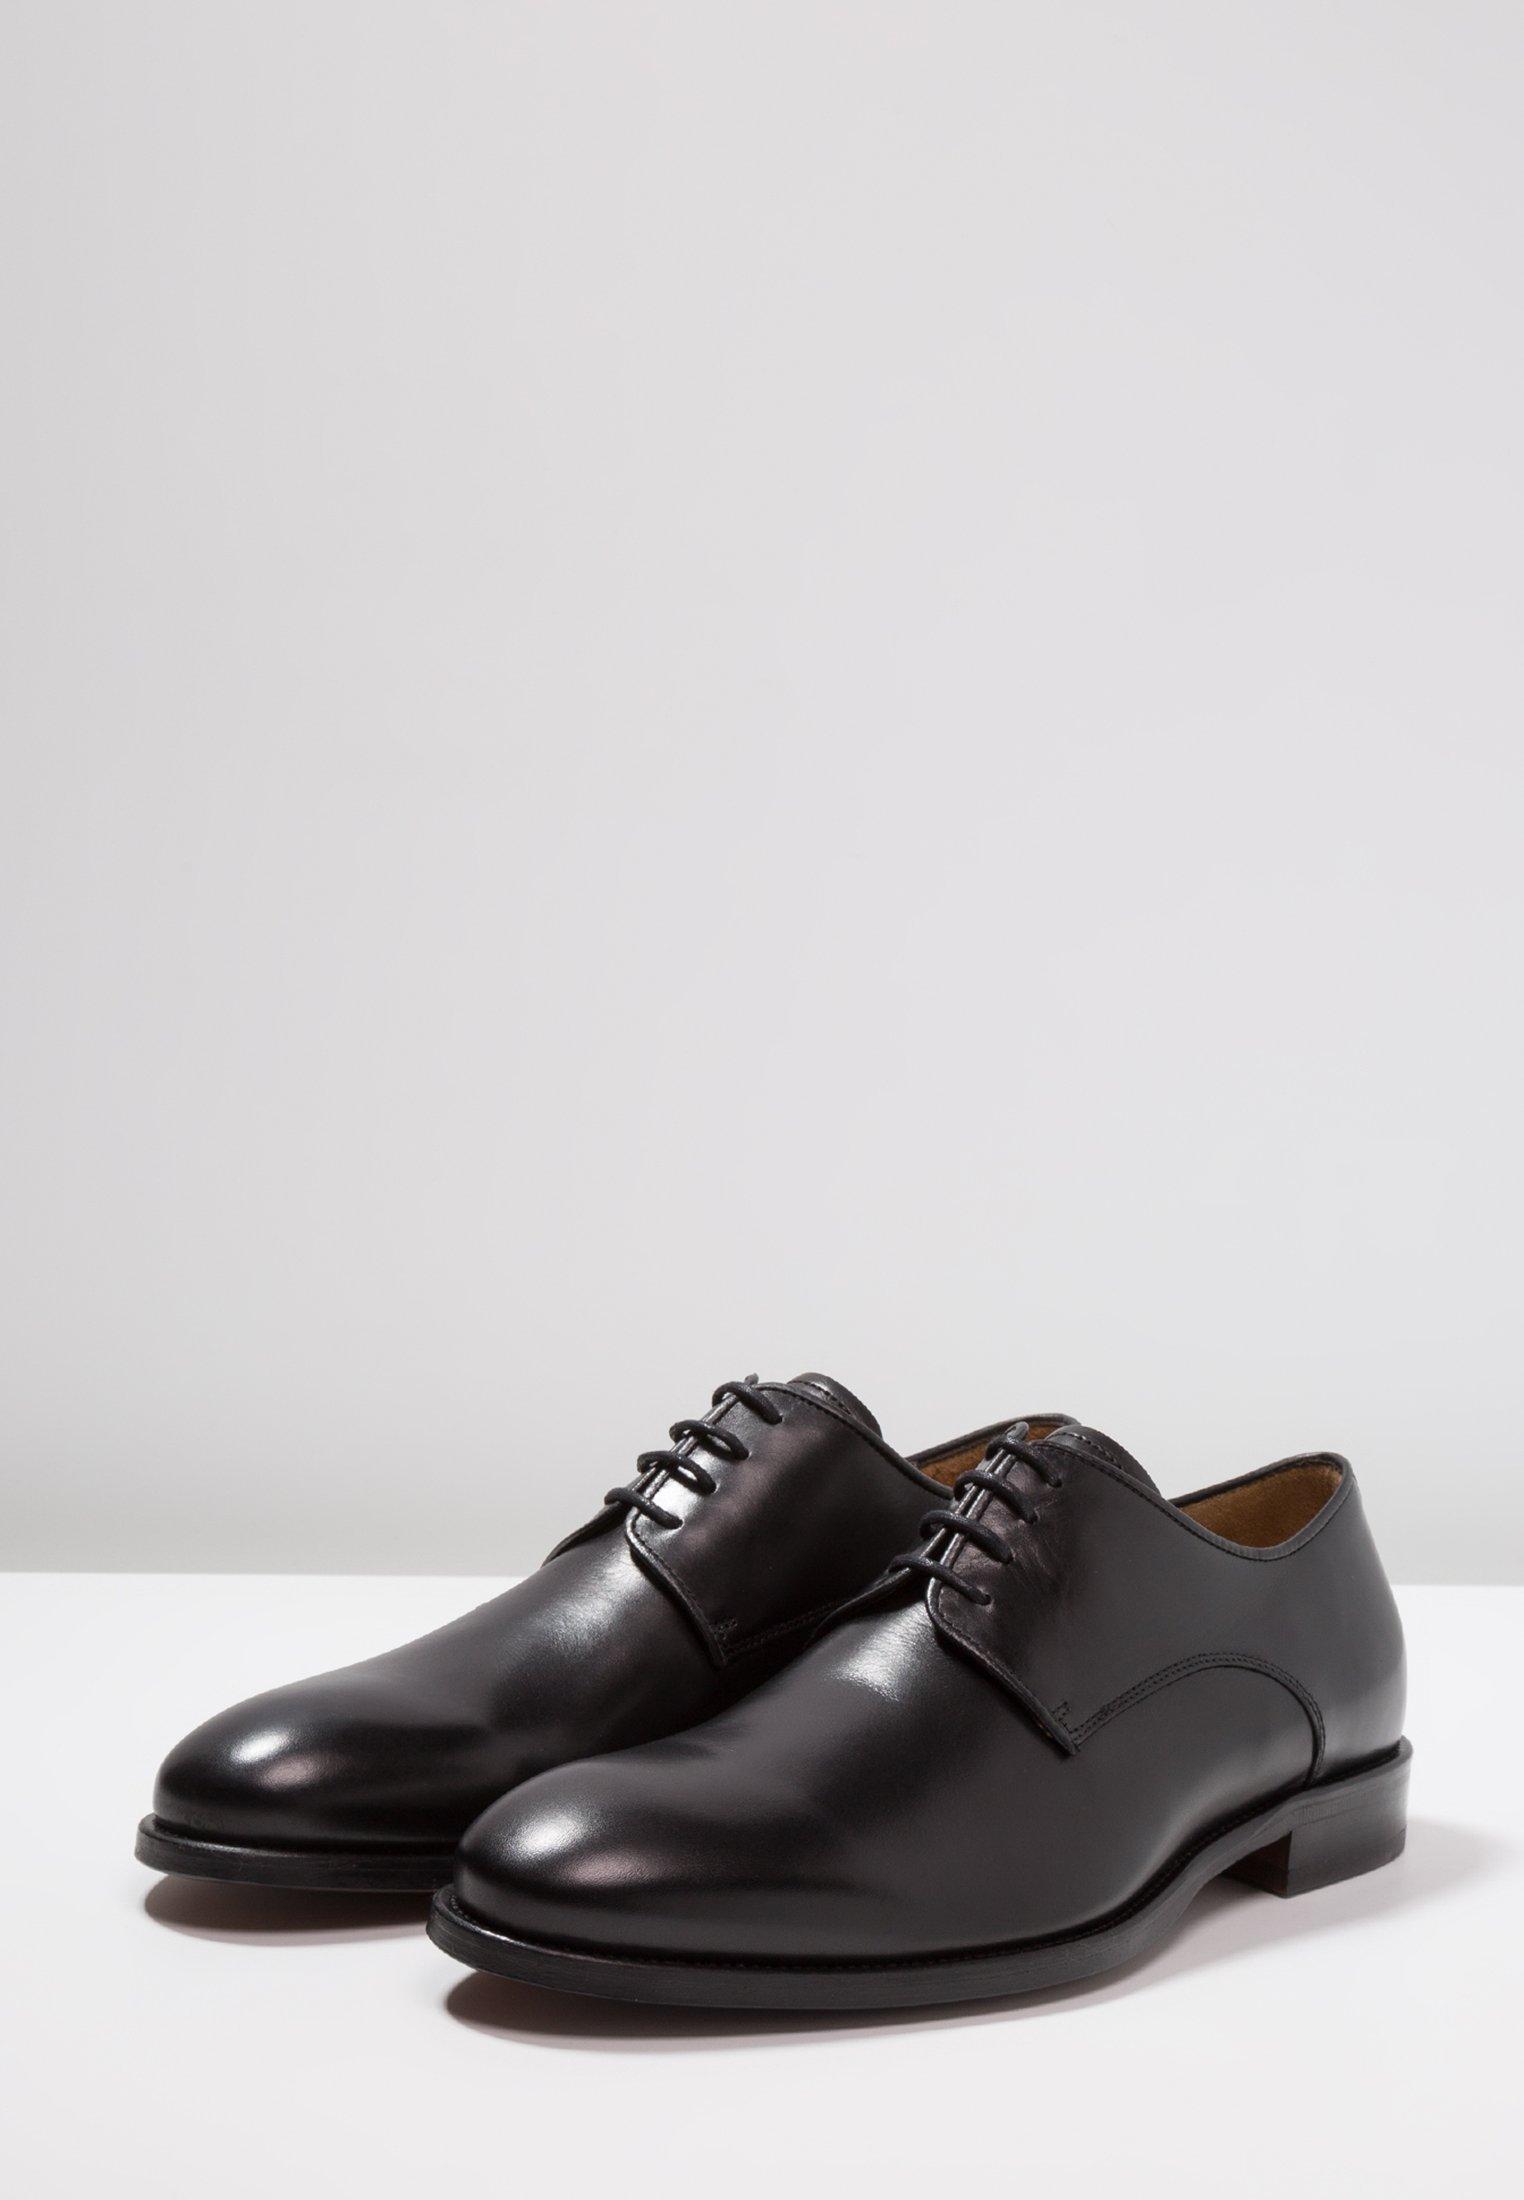 K ShoeDerbiesamp; Neil Black Filippa Richelieus Dress rdCxBoQWe